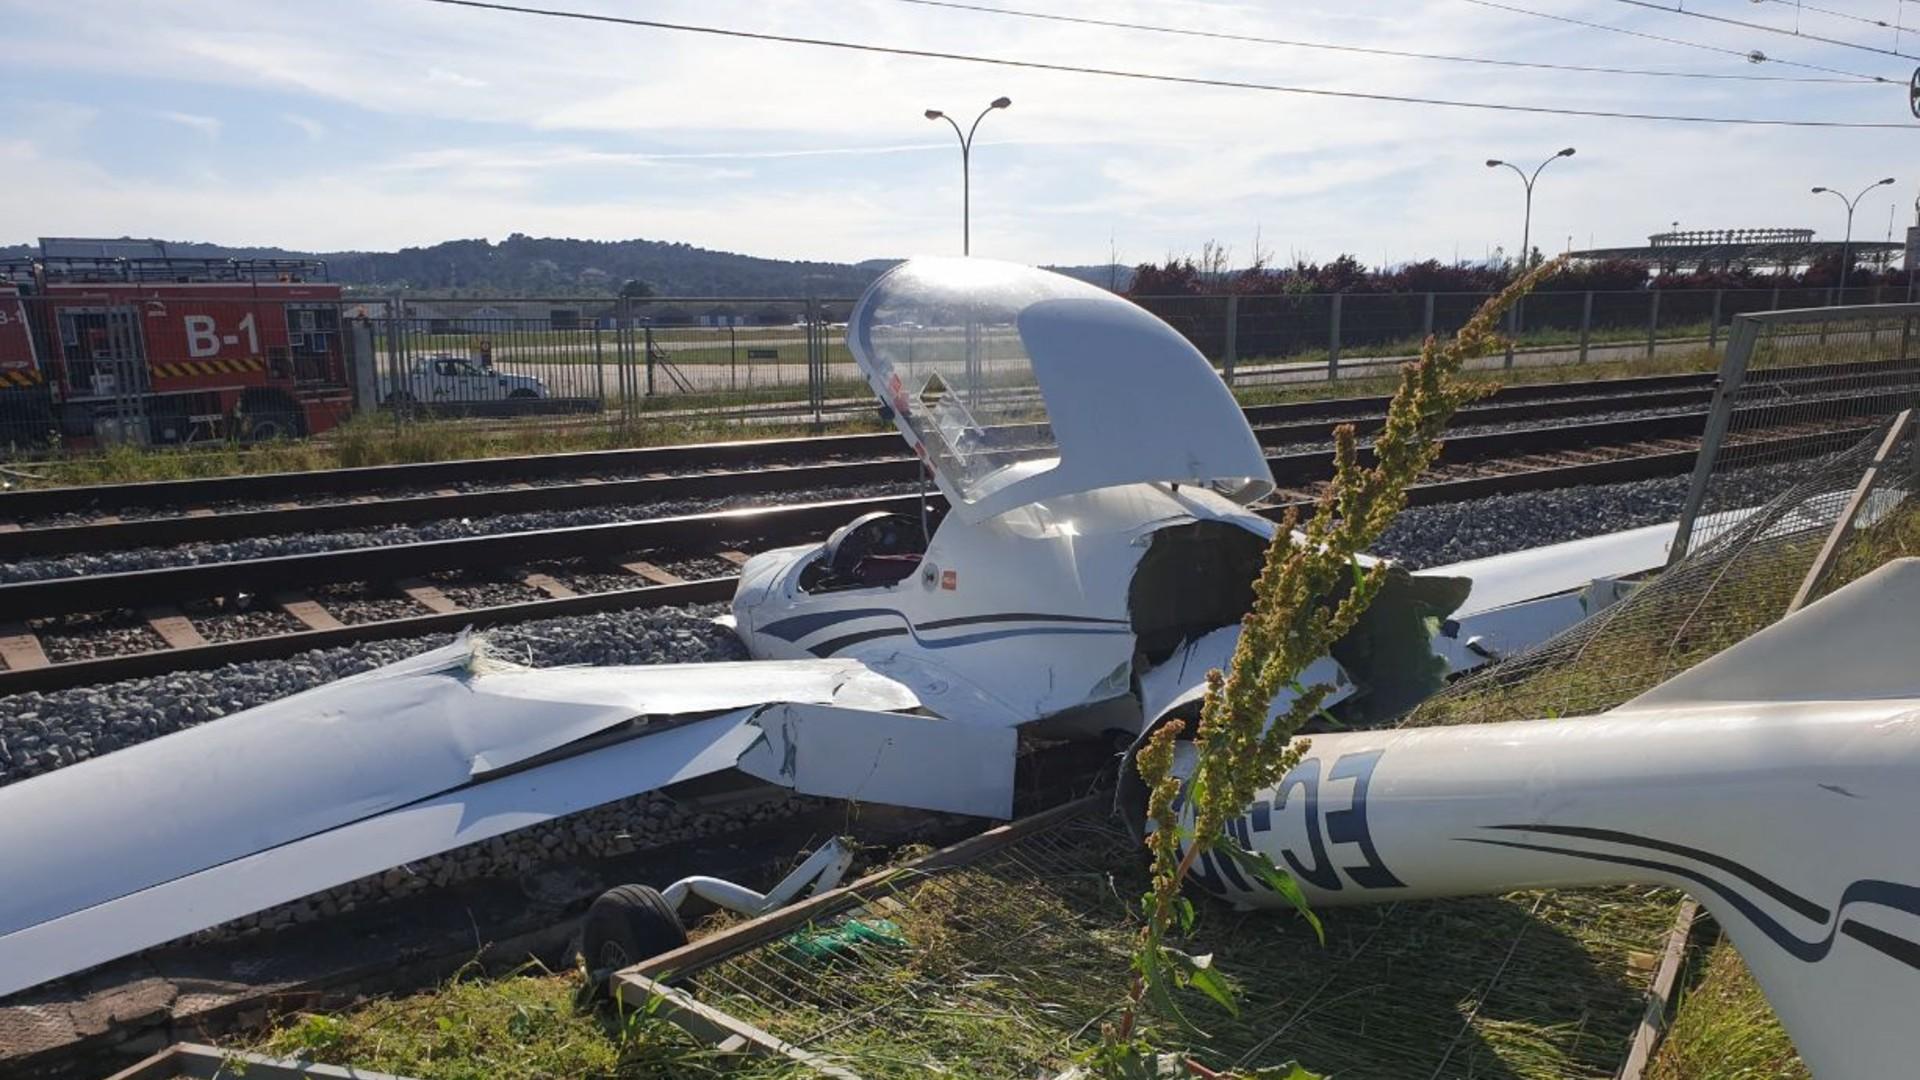 Accident avioneta